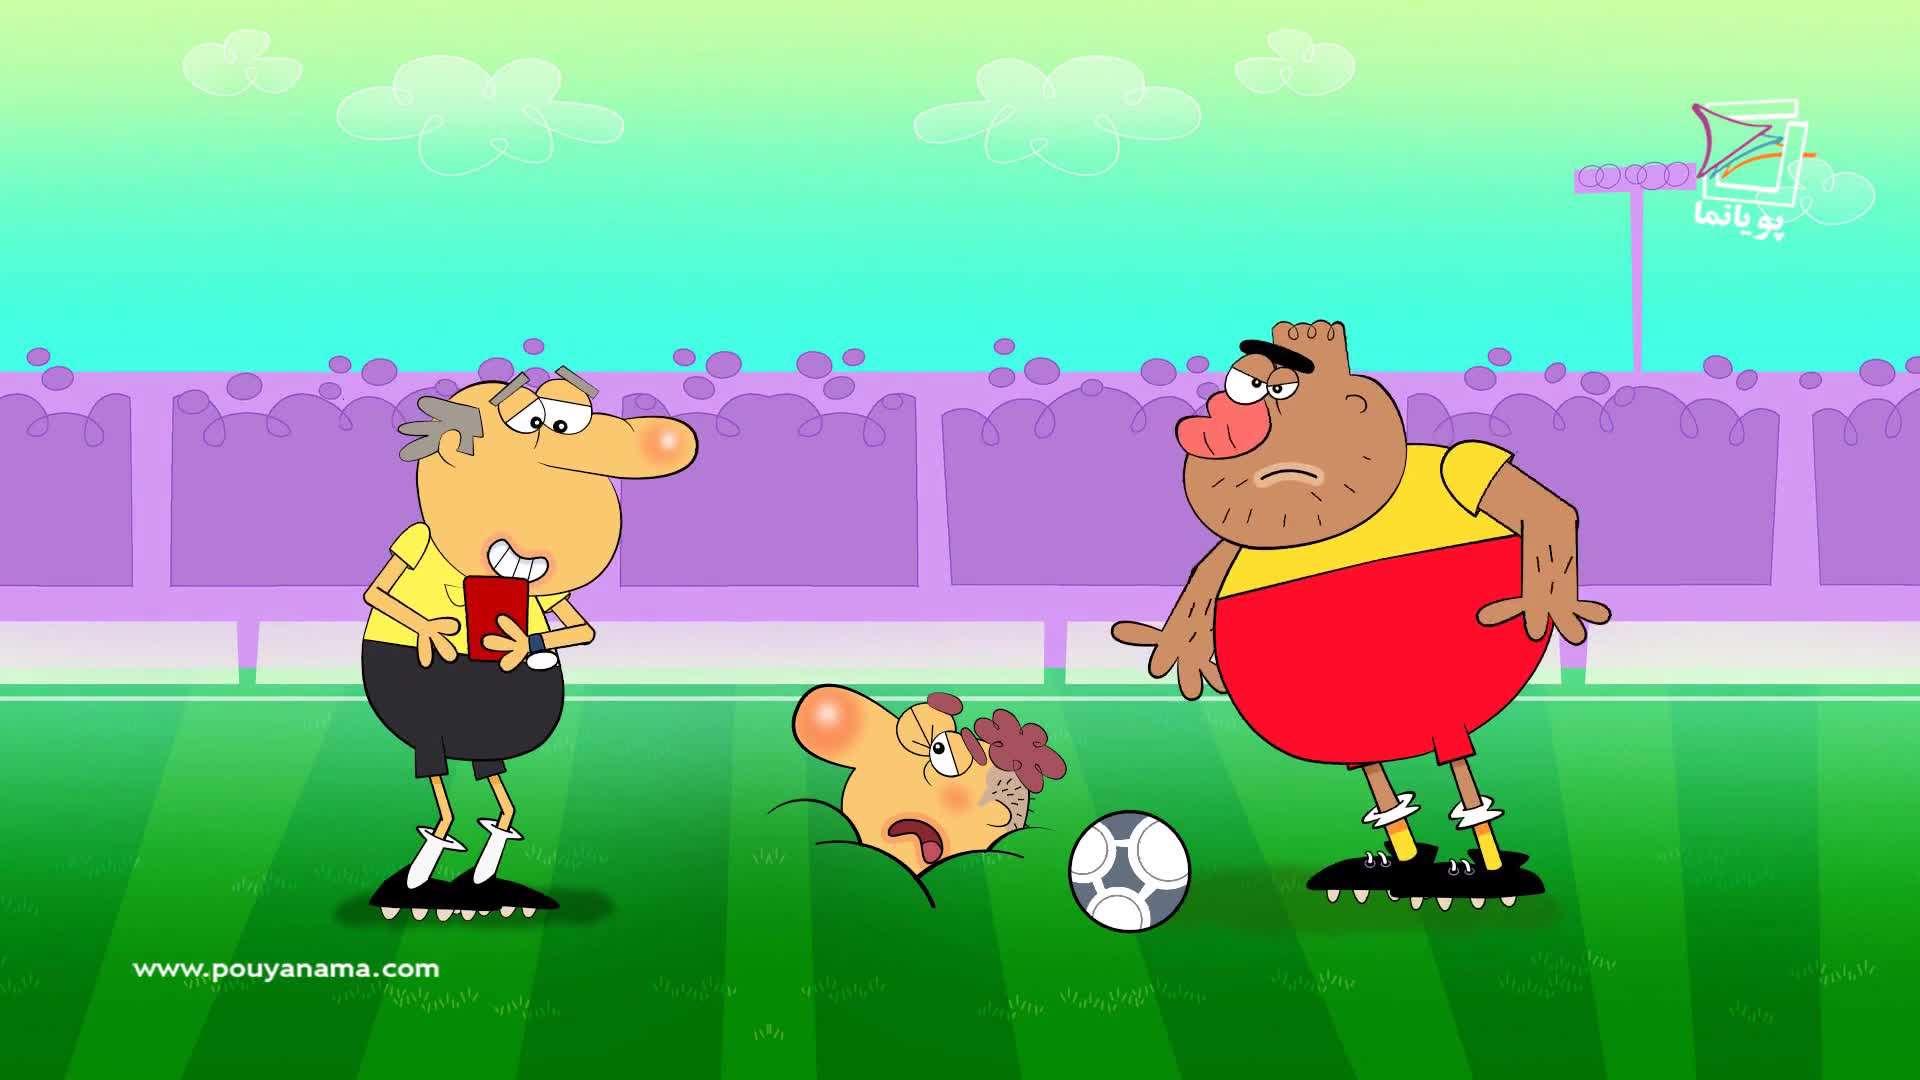 انیمیشن سریالی ایرانی فوتبال مدرن / قسمت 11